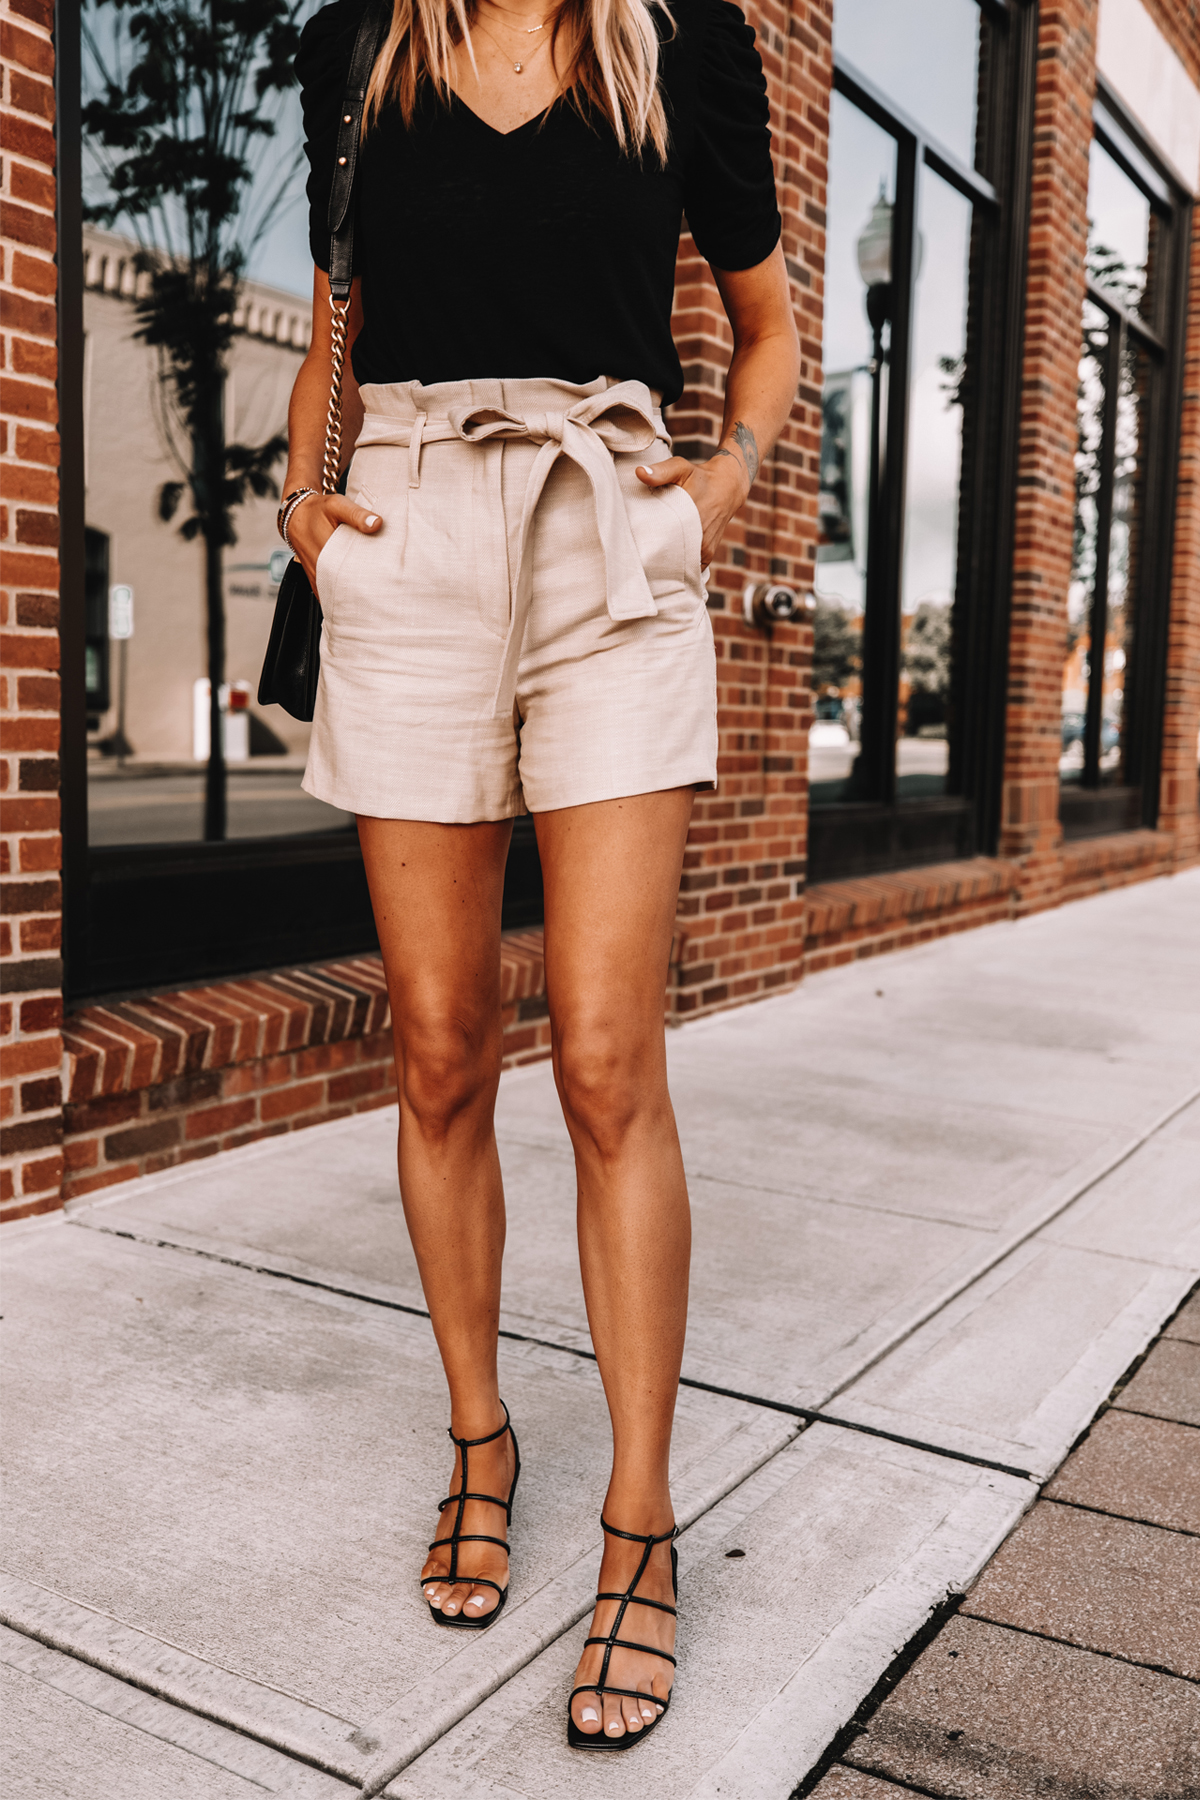 Fashion Jackson Wearing Express Black Vneck T-Shirt Tan Paperbag Waist Shorts Black Sandals Summer Outfit